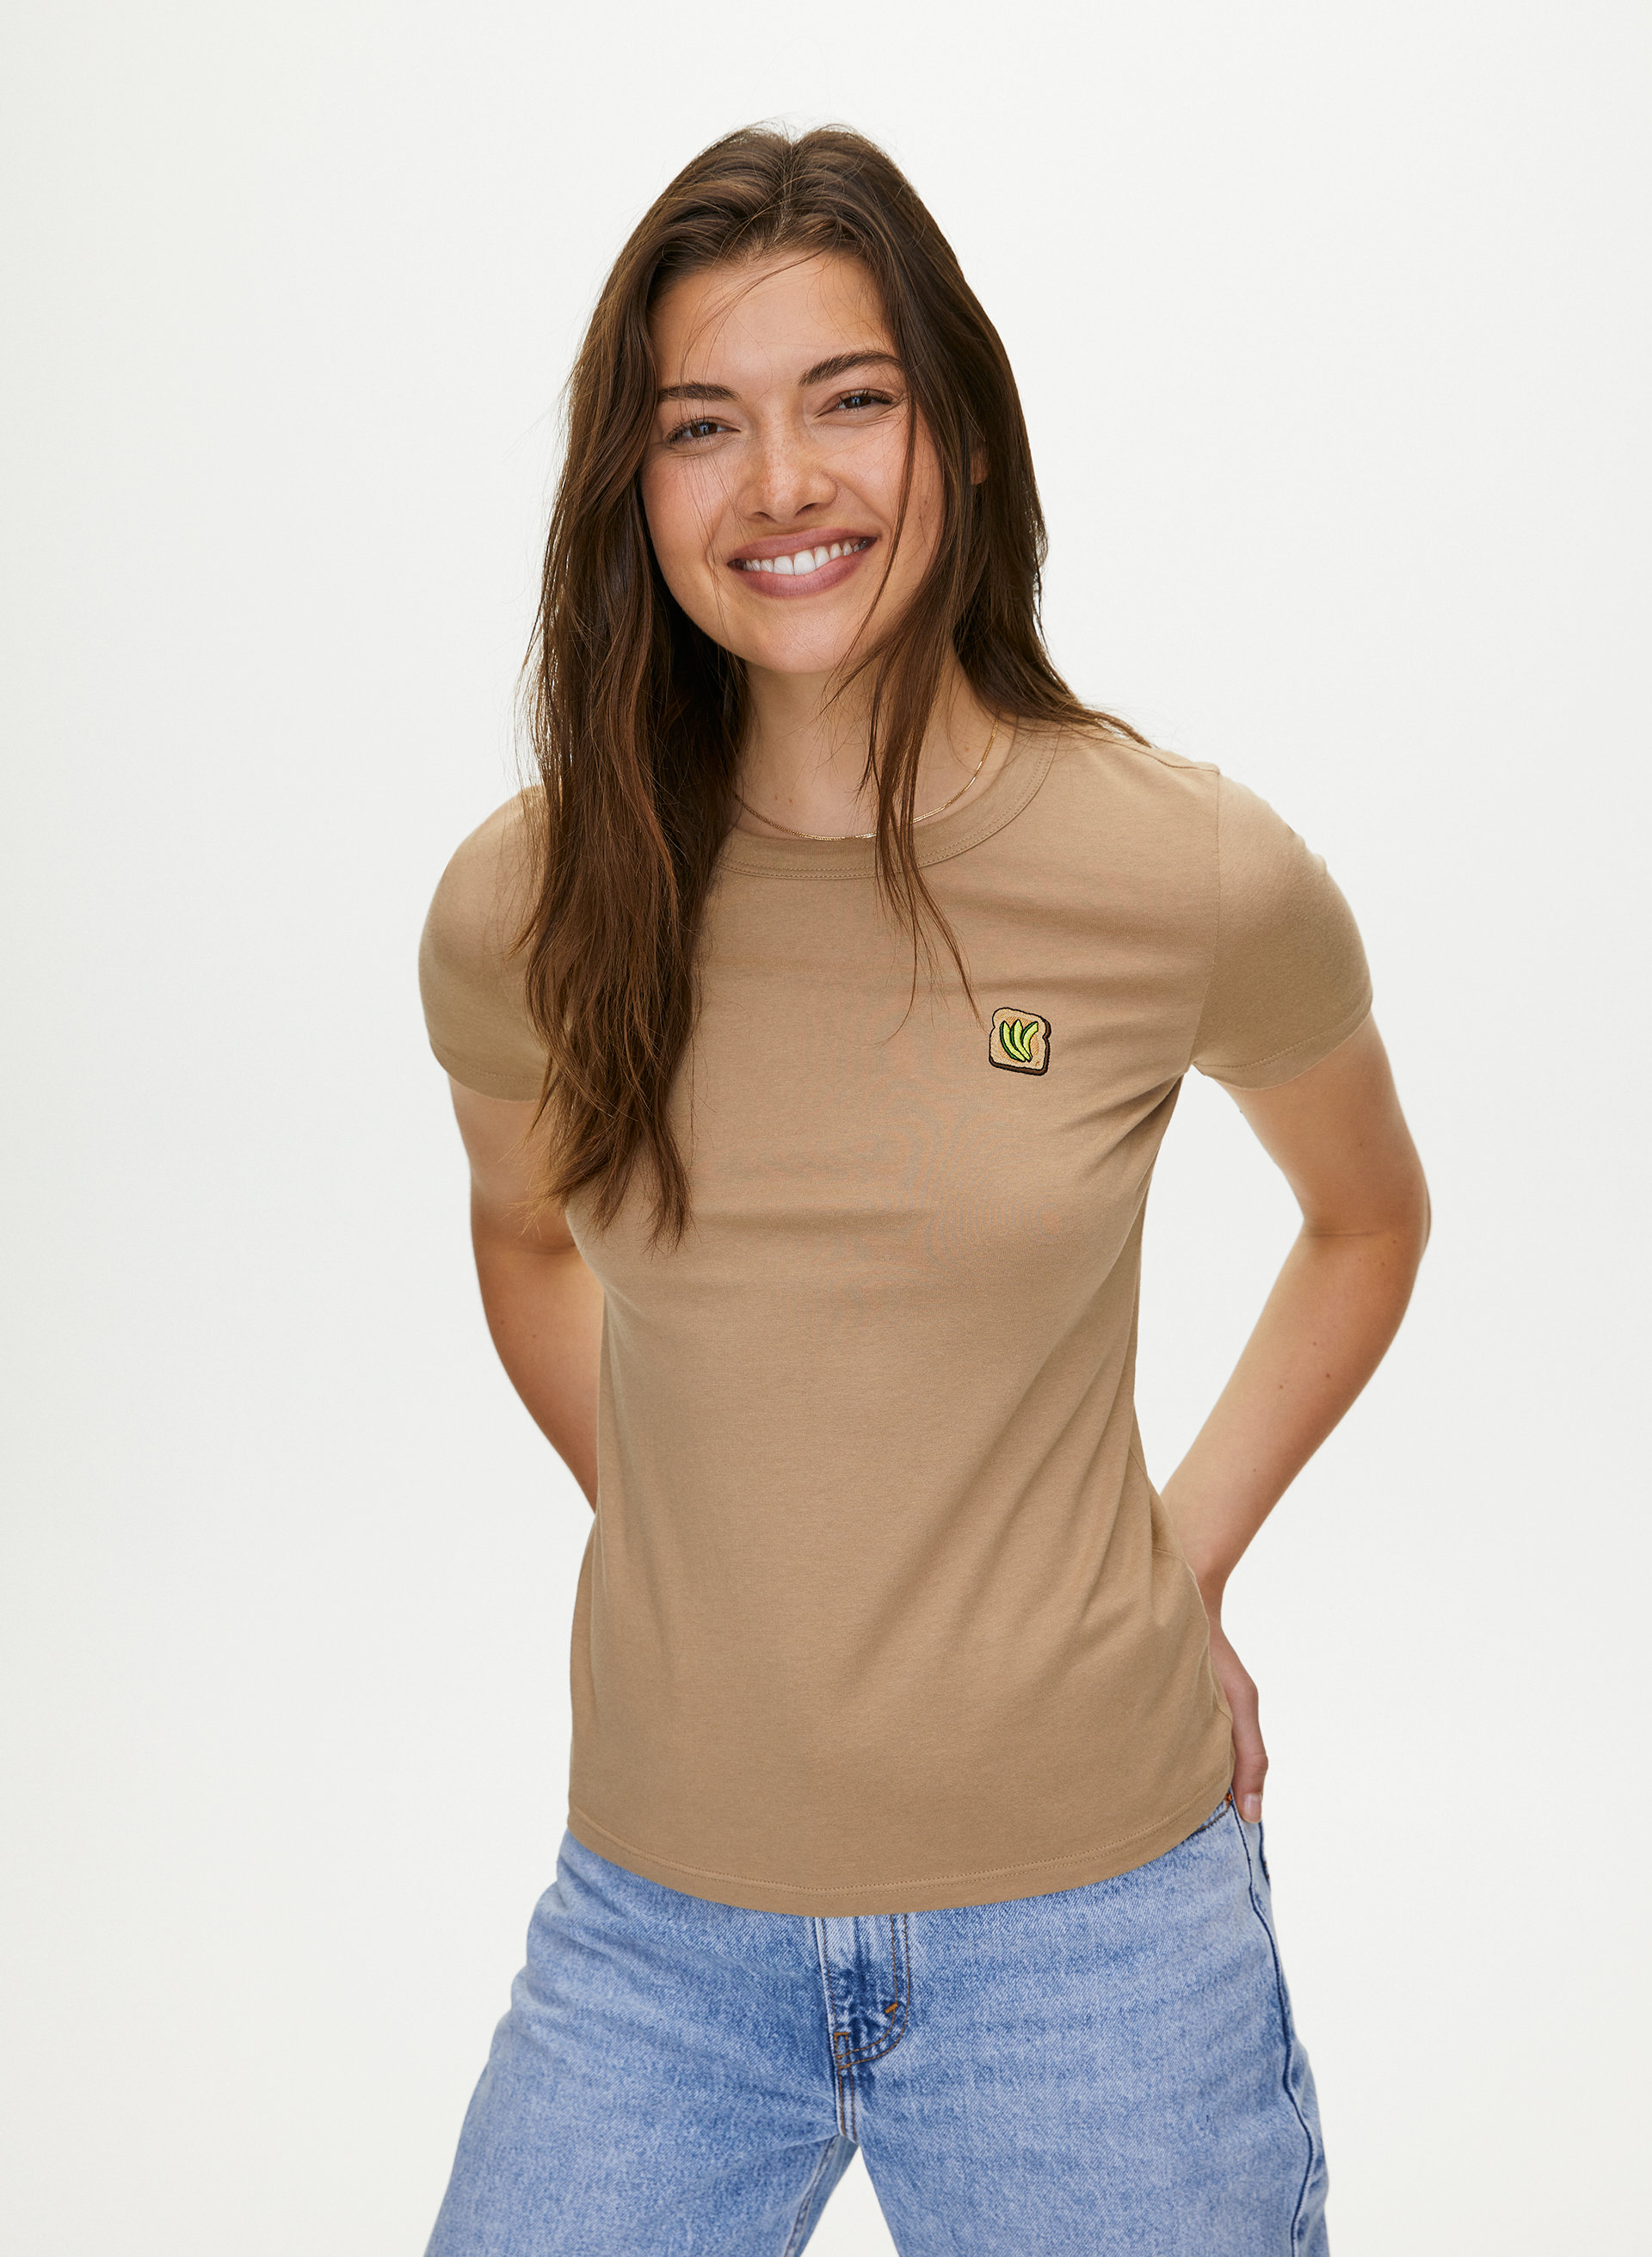 Cotton Candy T-Shirt, Niedliches Shirt aus dem Hause